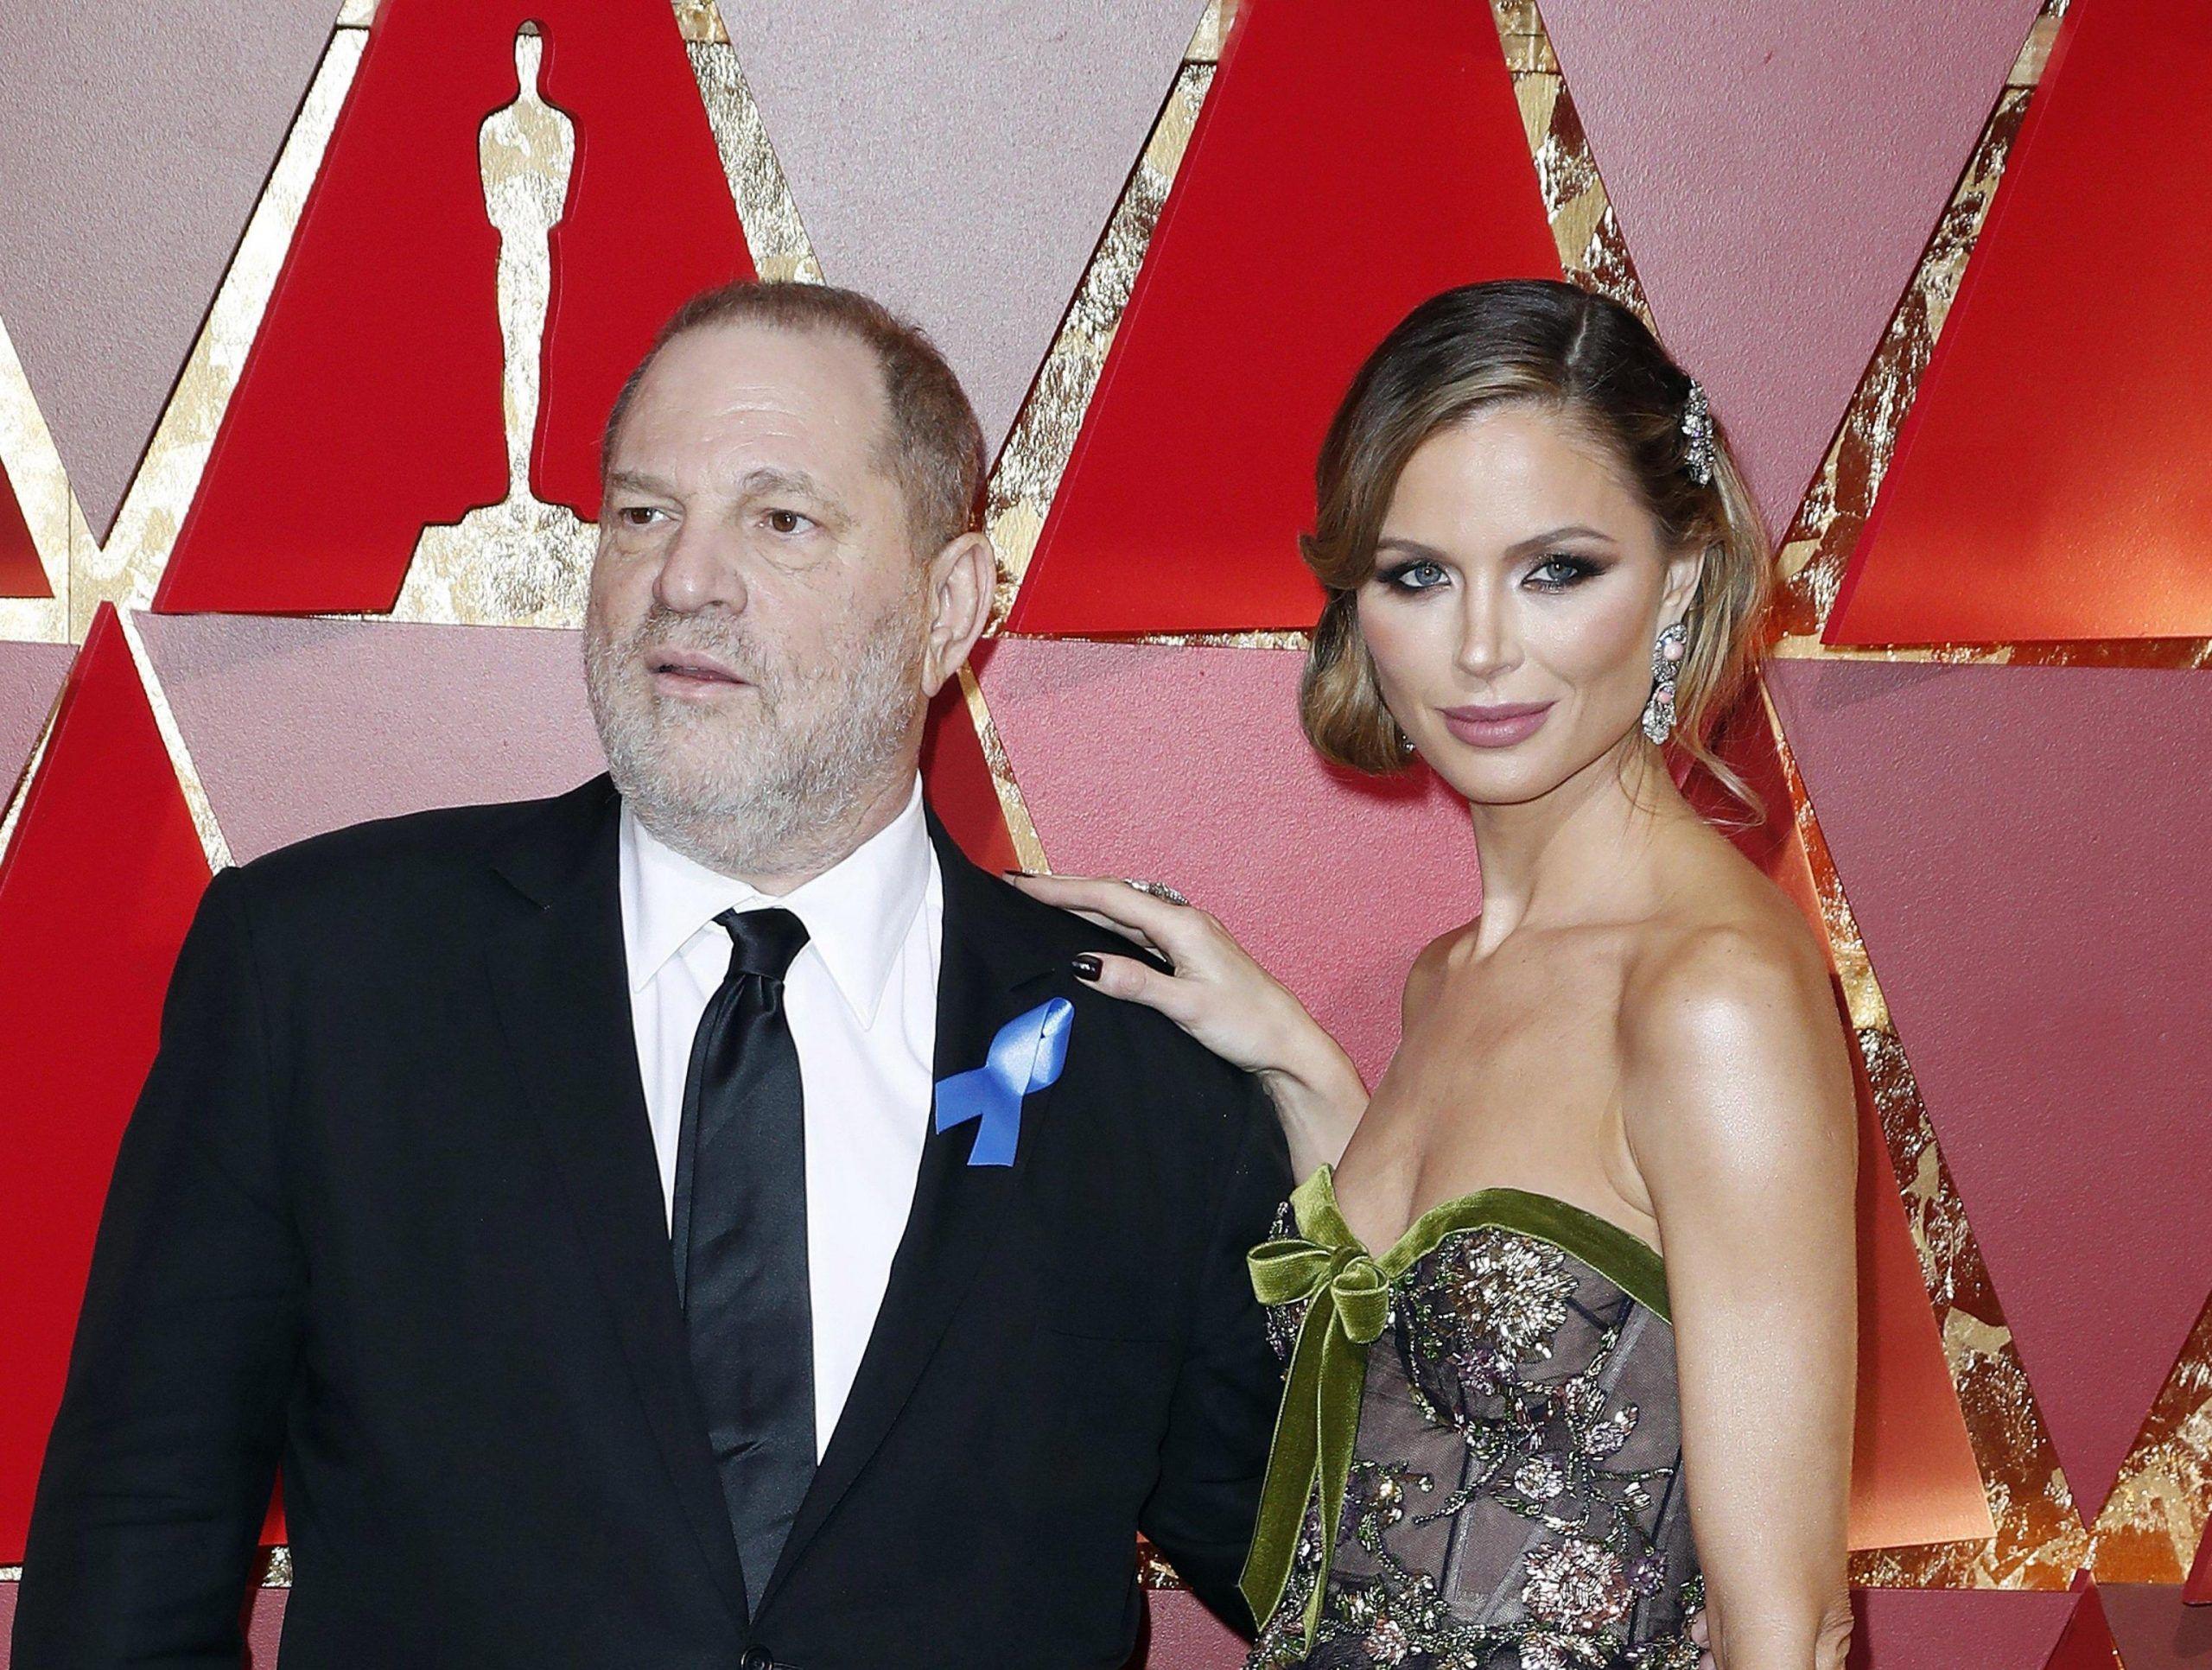 Harvey Weinstein expelled from Oscars Academy